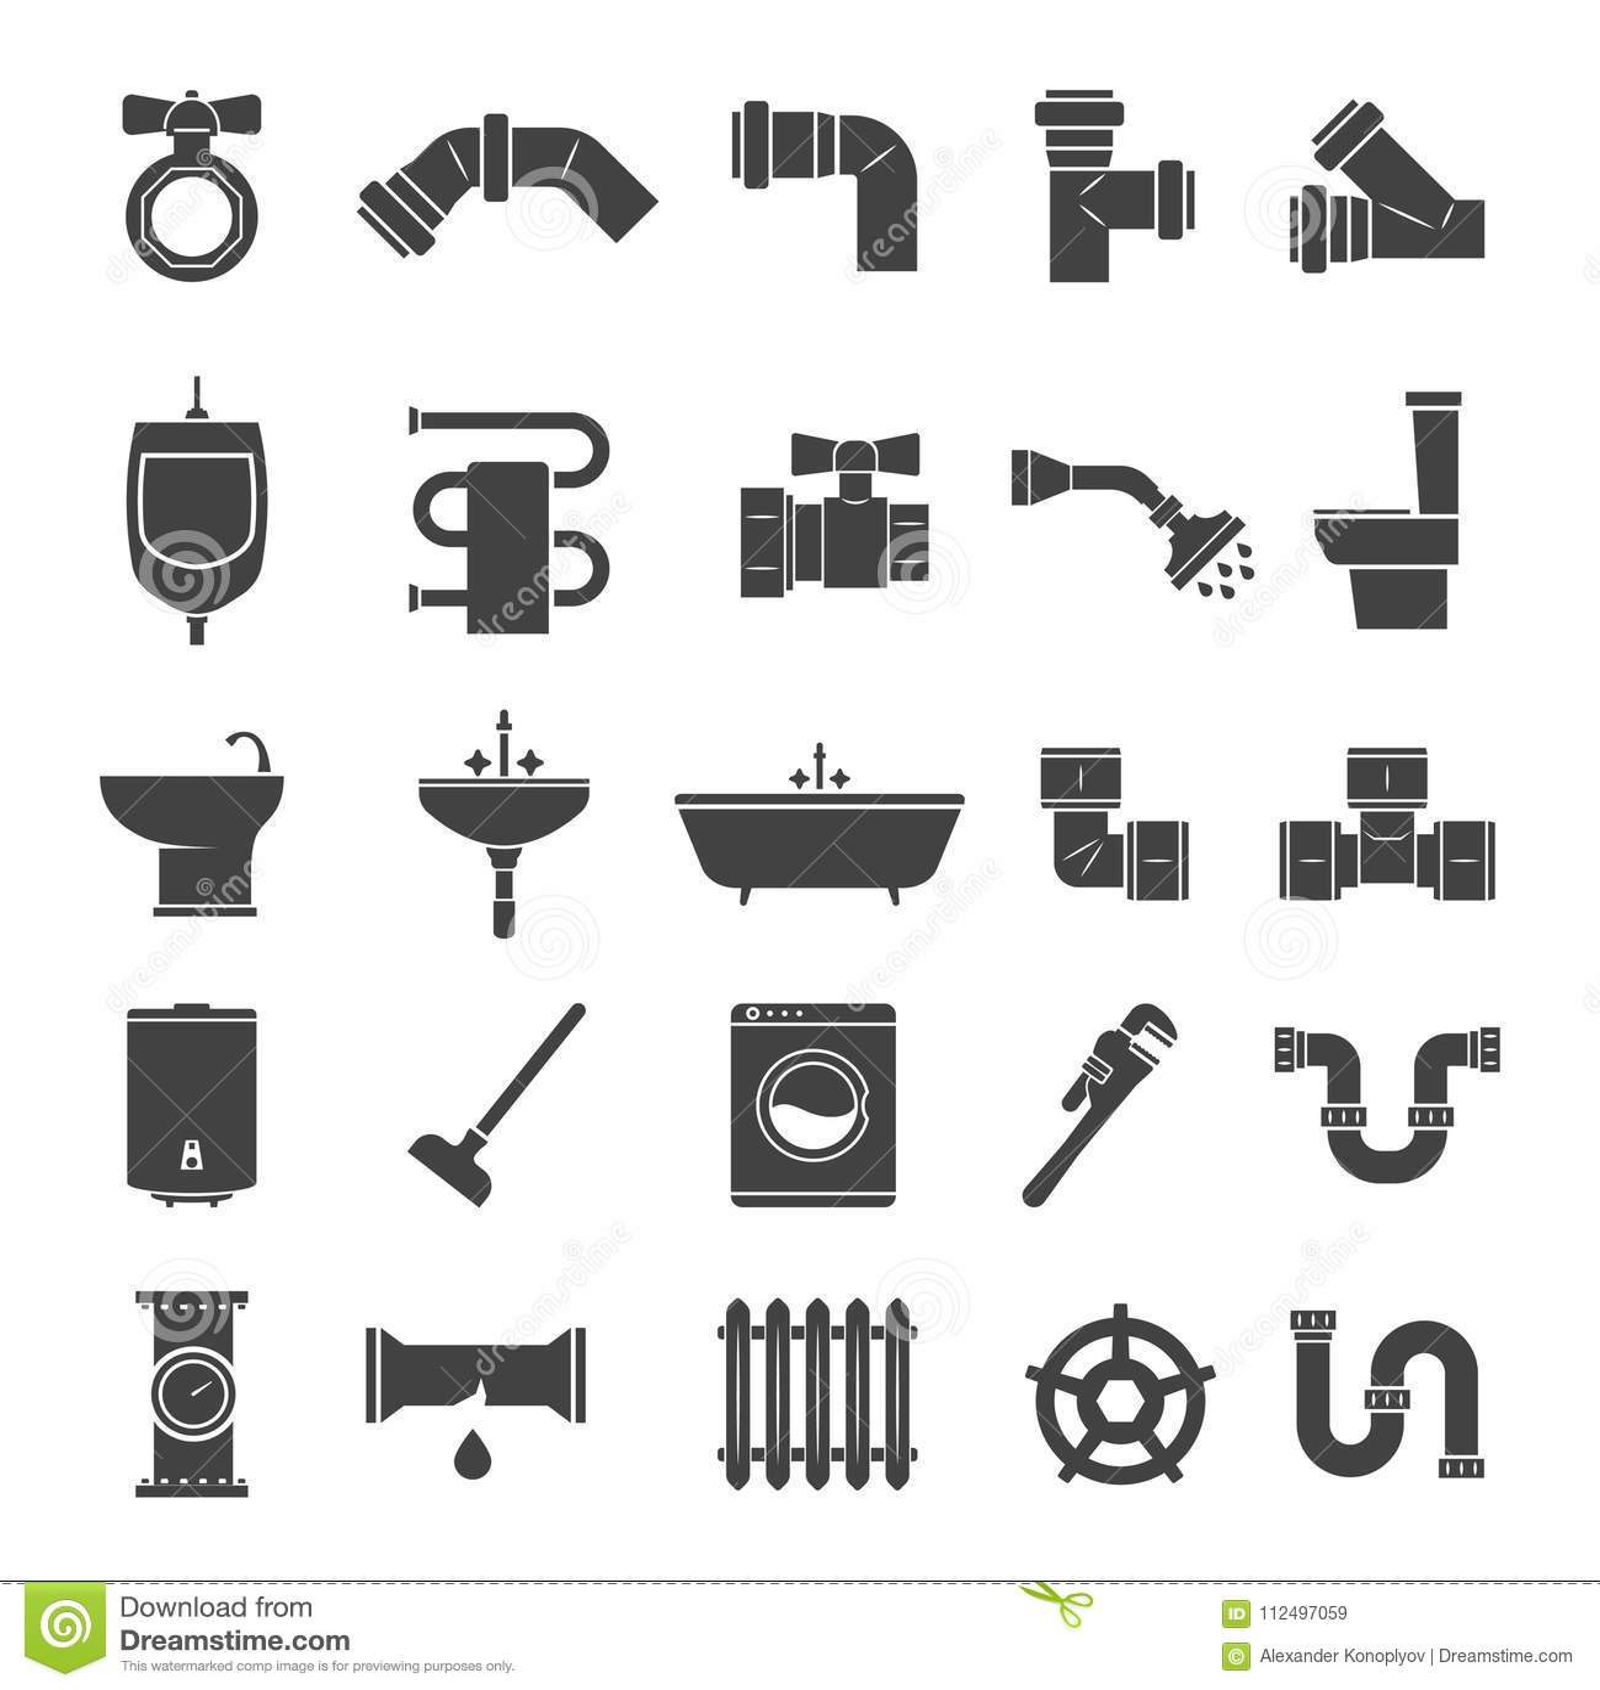 Pipe Fitting Vector Set. Pipeline Vector Illustration